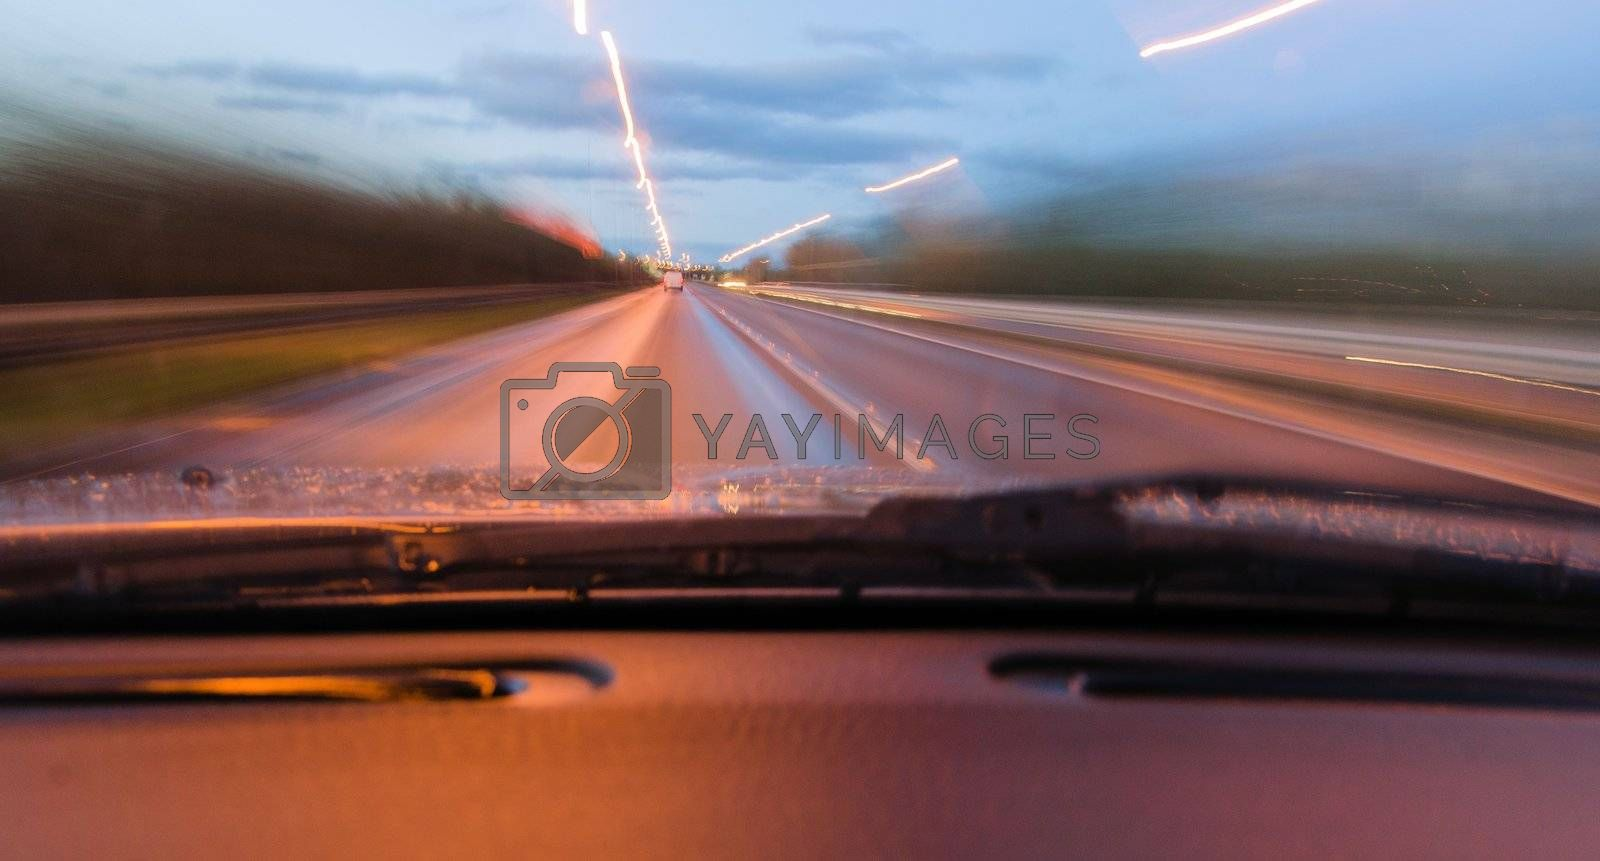 View through a car windscreen